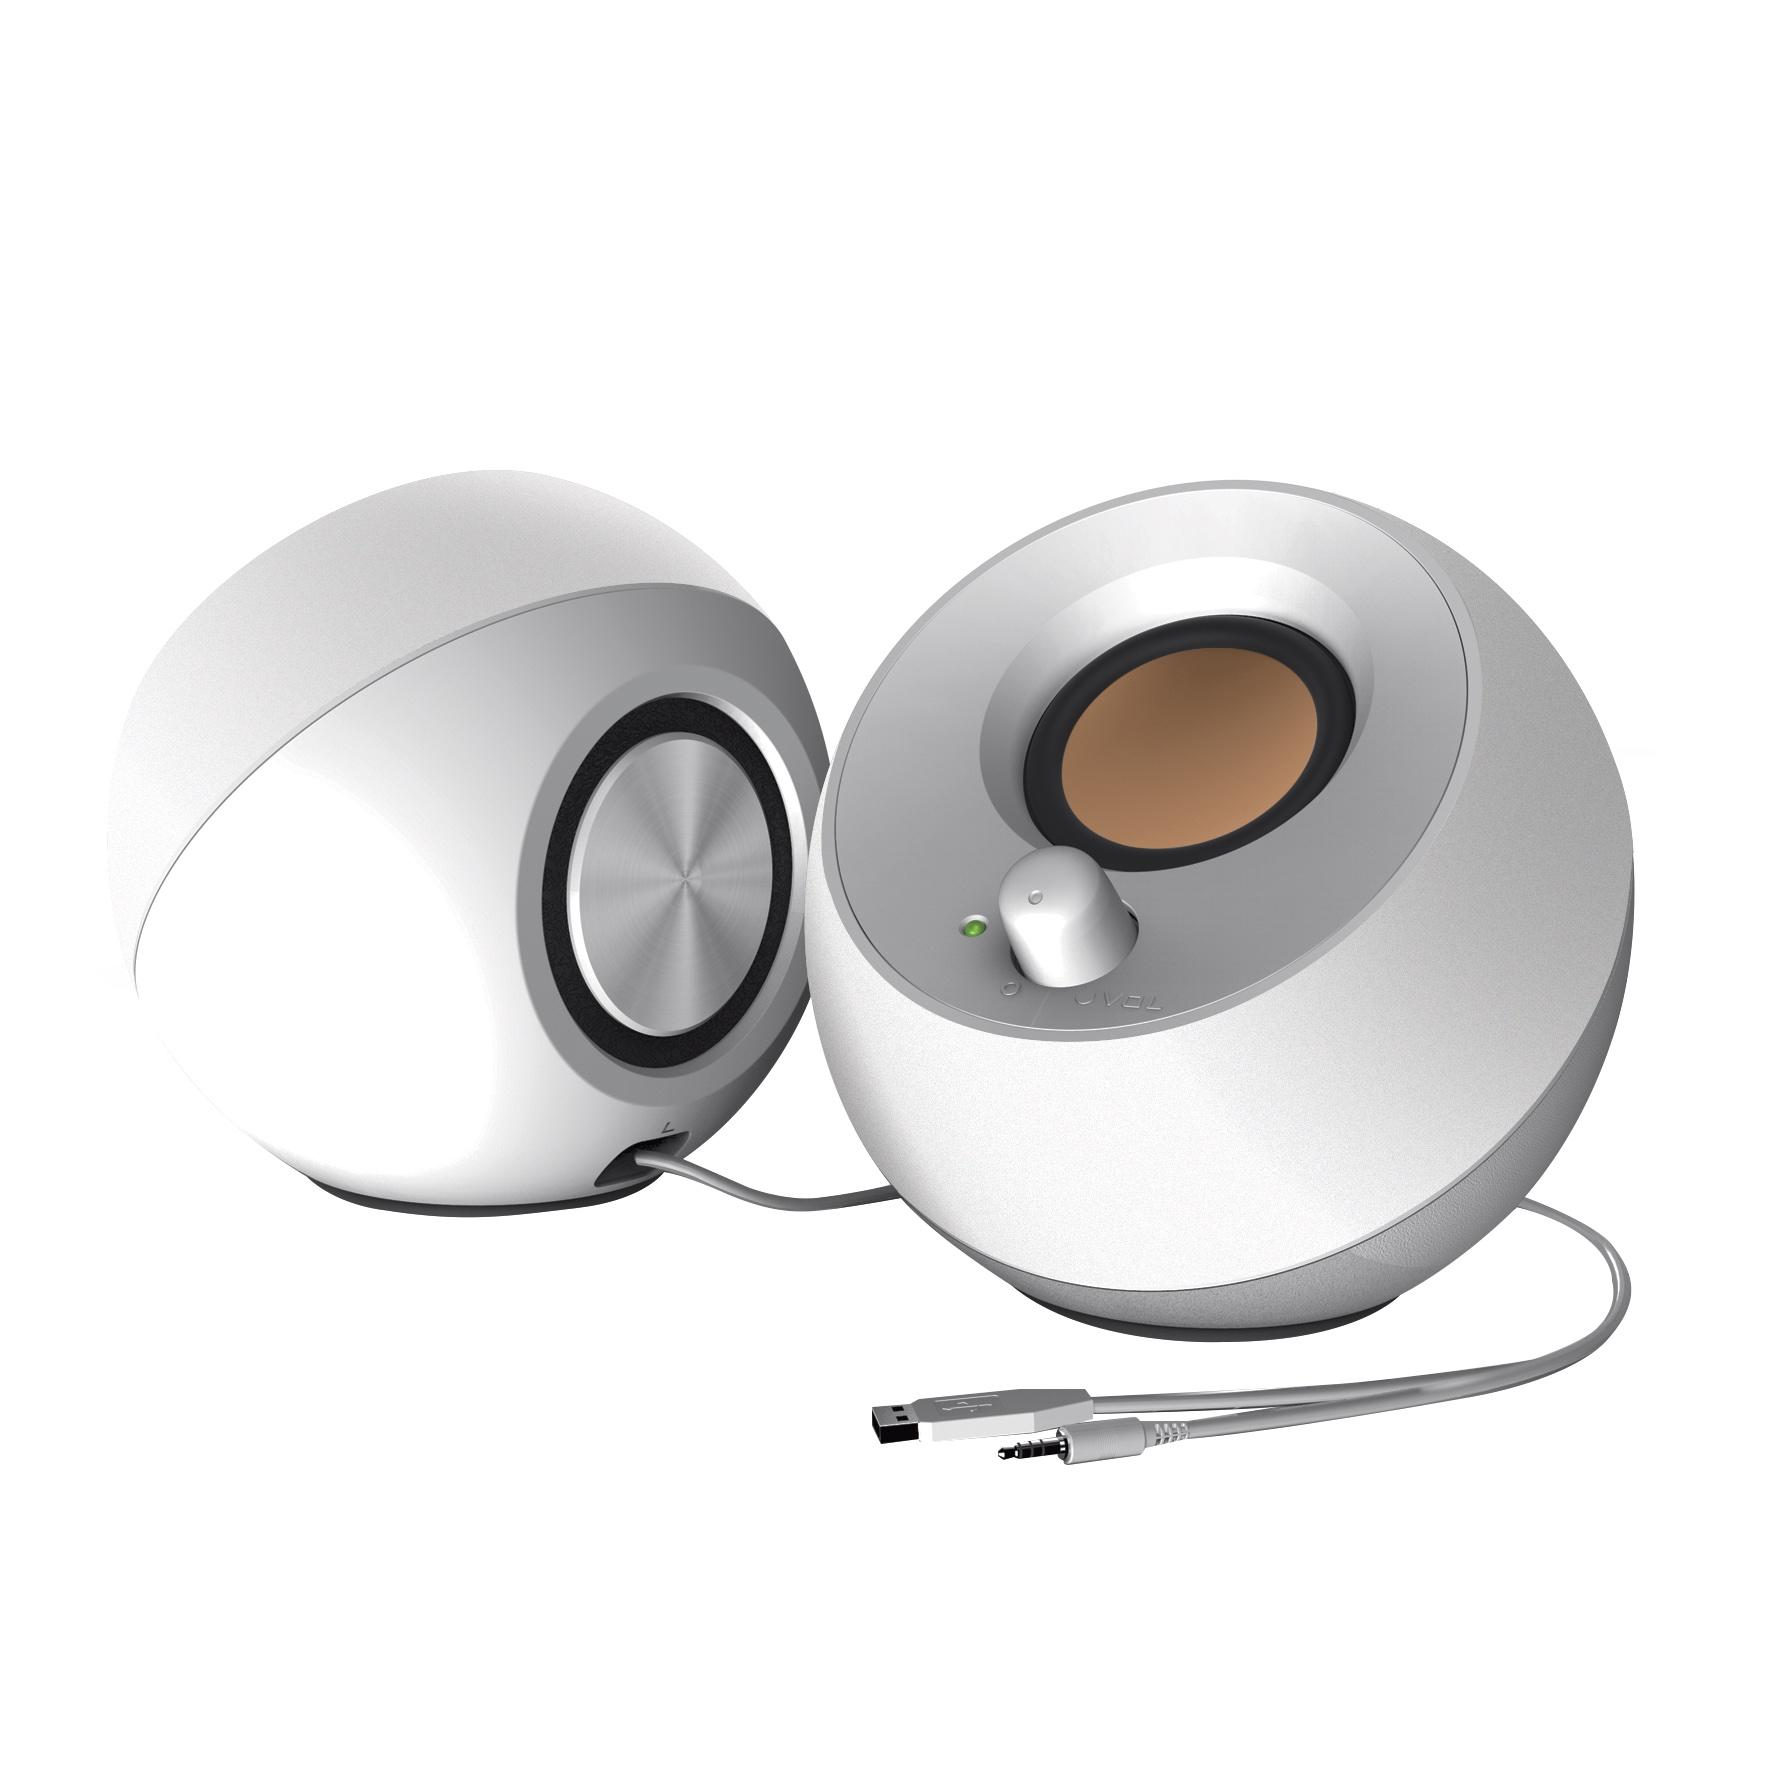 Creative Pebble Modern 2.0 USB Desktop Speakers